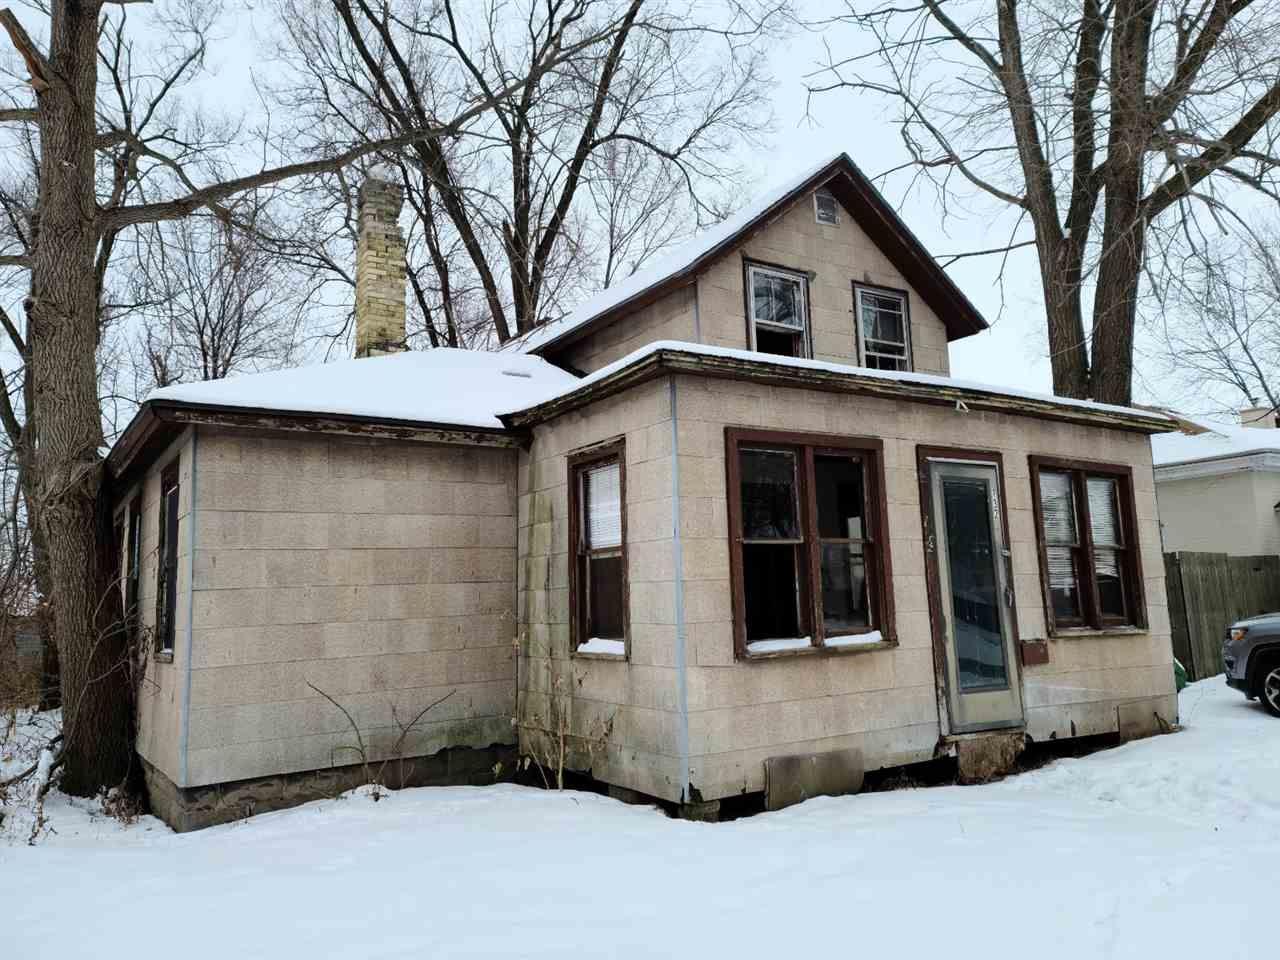 132 E Burns St, Portage, WI 53901 - #: 1900545